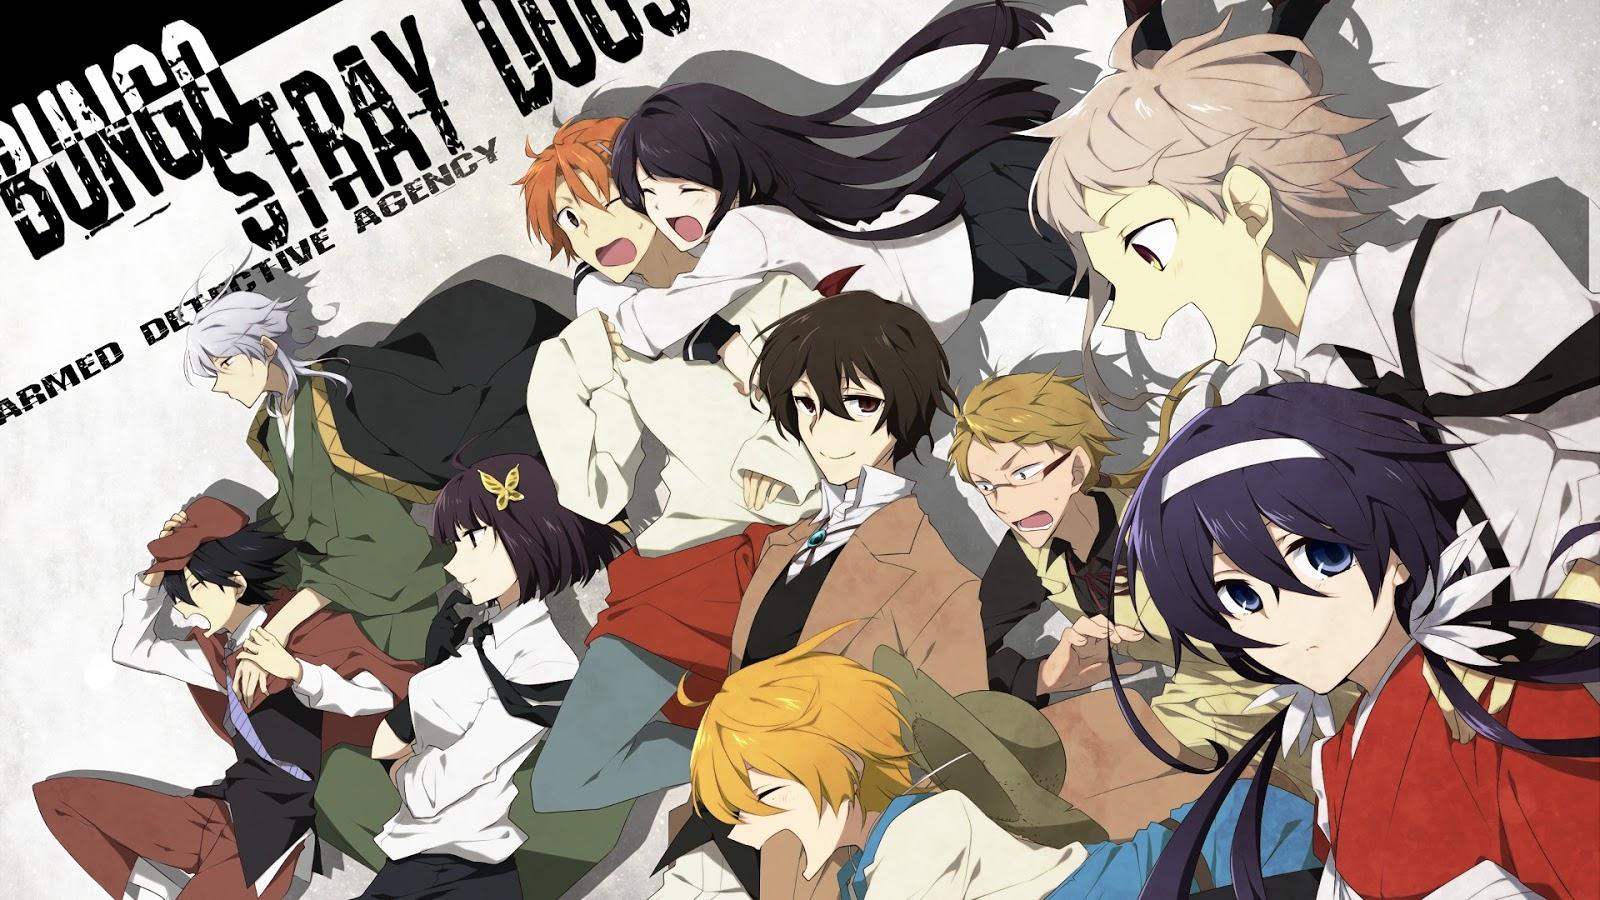 Bungou Stray Dogs - Movie Announced - Yu Alexius Anime Portal